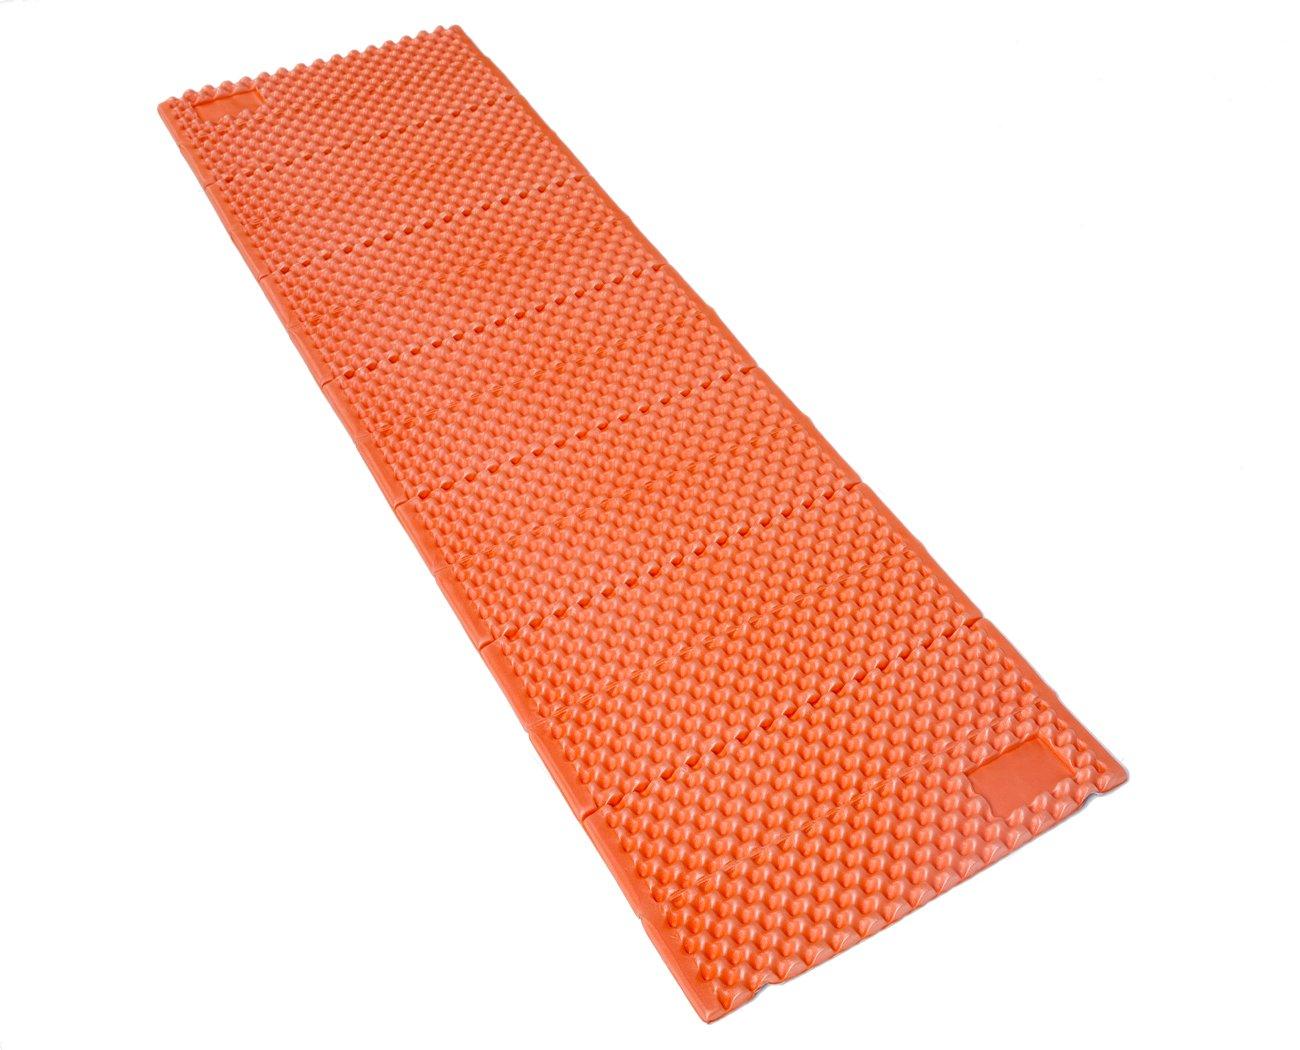 Geertop Camp Pad - Portable Lightweight Folding Foam Mat Mattress Cushion for Outdoor Hiking Camping Backpacking (Orange, Regular) by Geertop